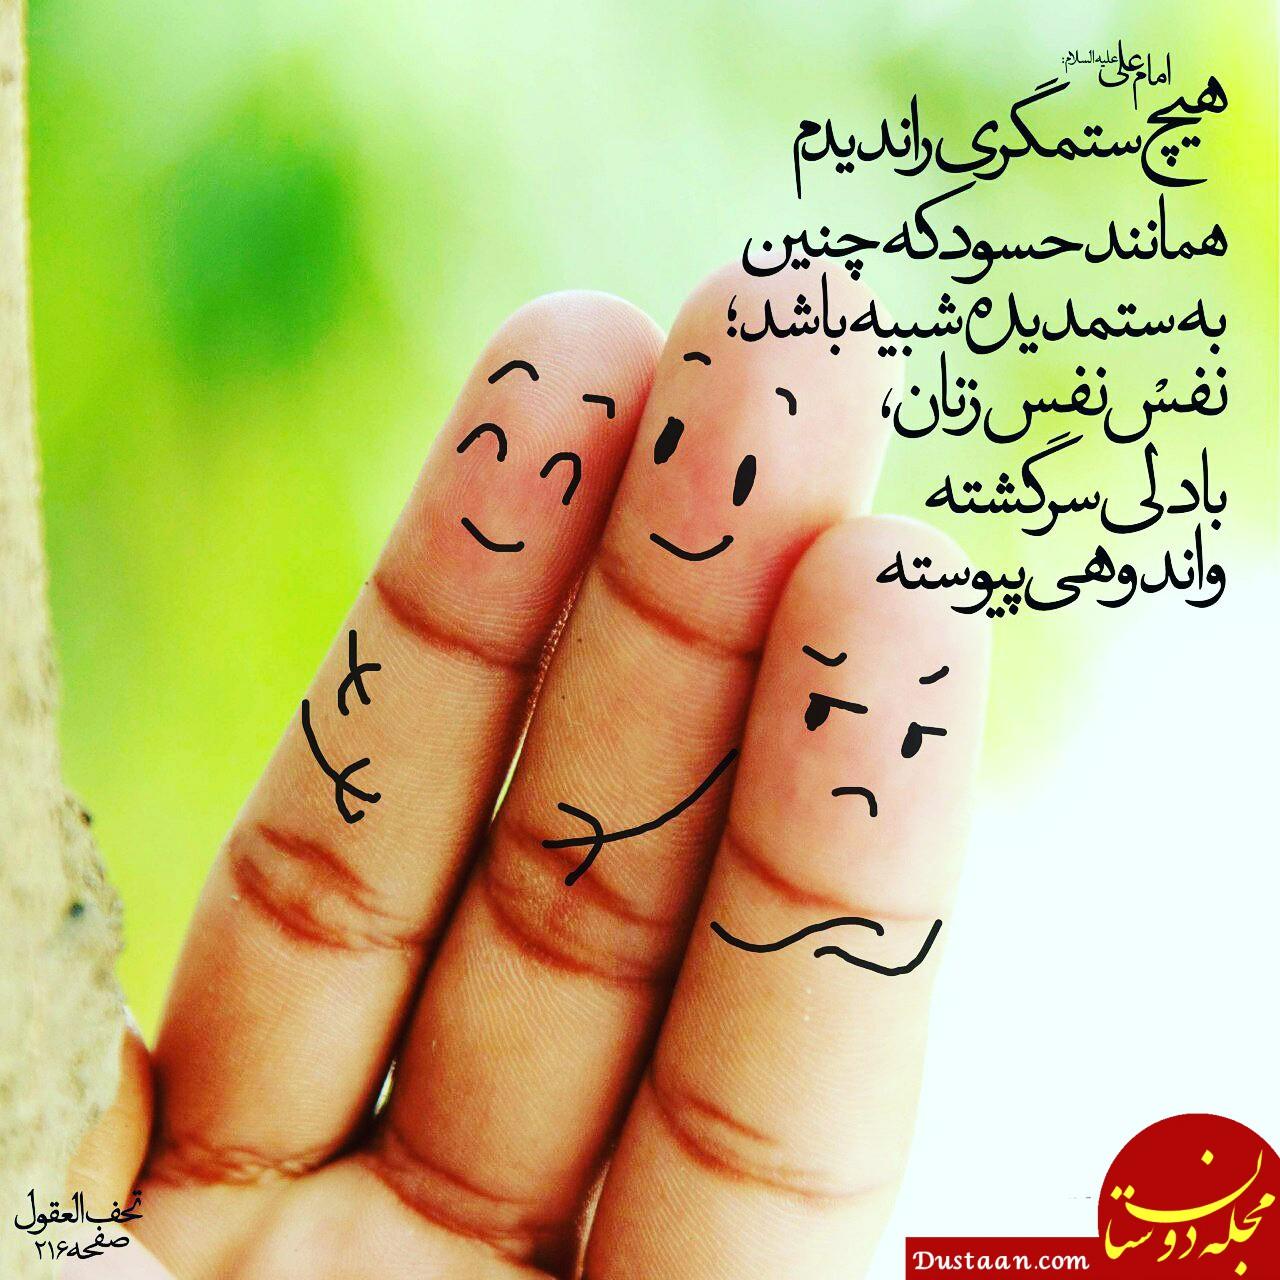 www.dustaan.com حسادت را بهتر درک کنیم!